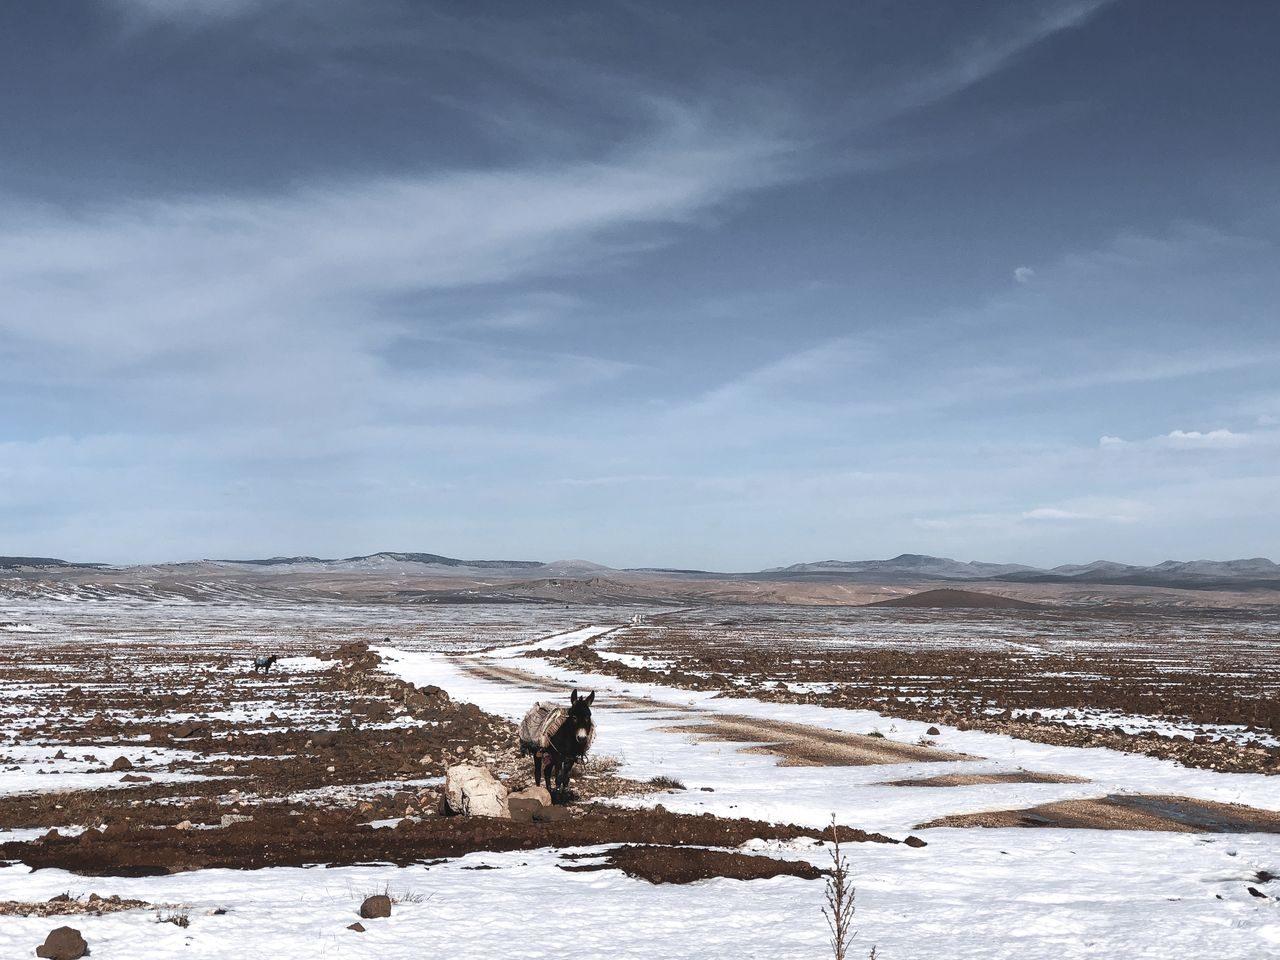 le Maroc en van - Moyen Atlas IFRANE (2)